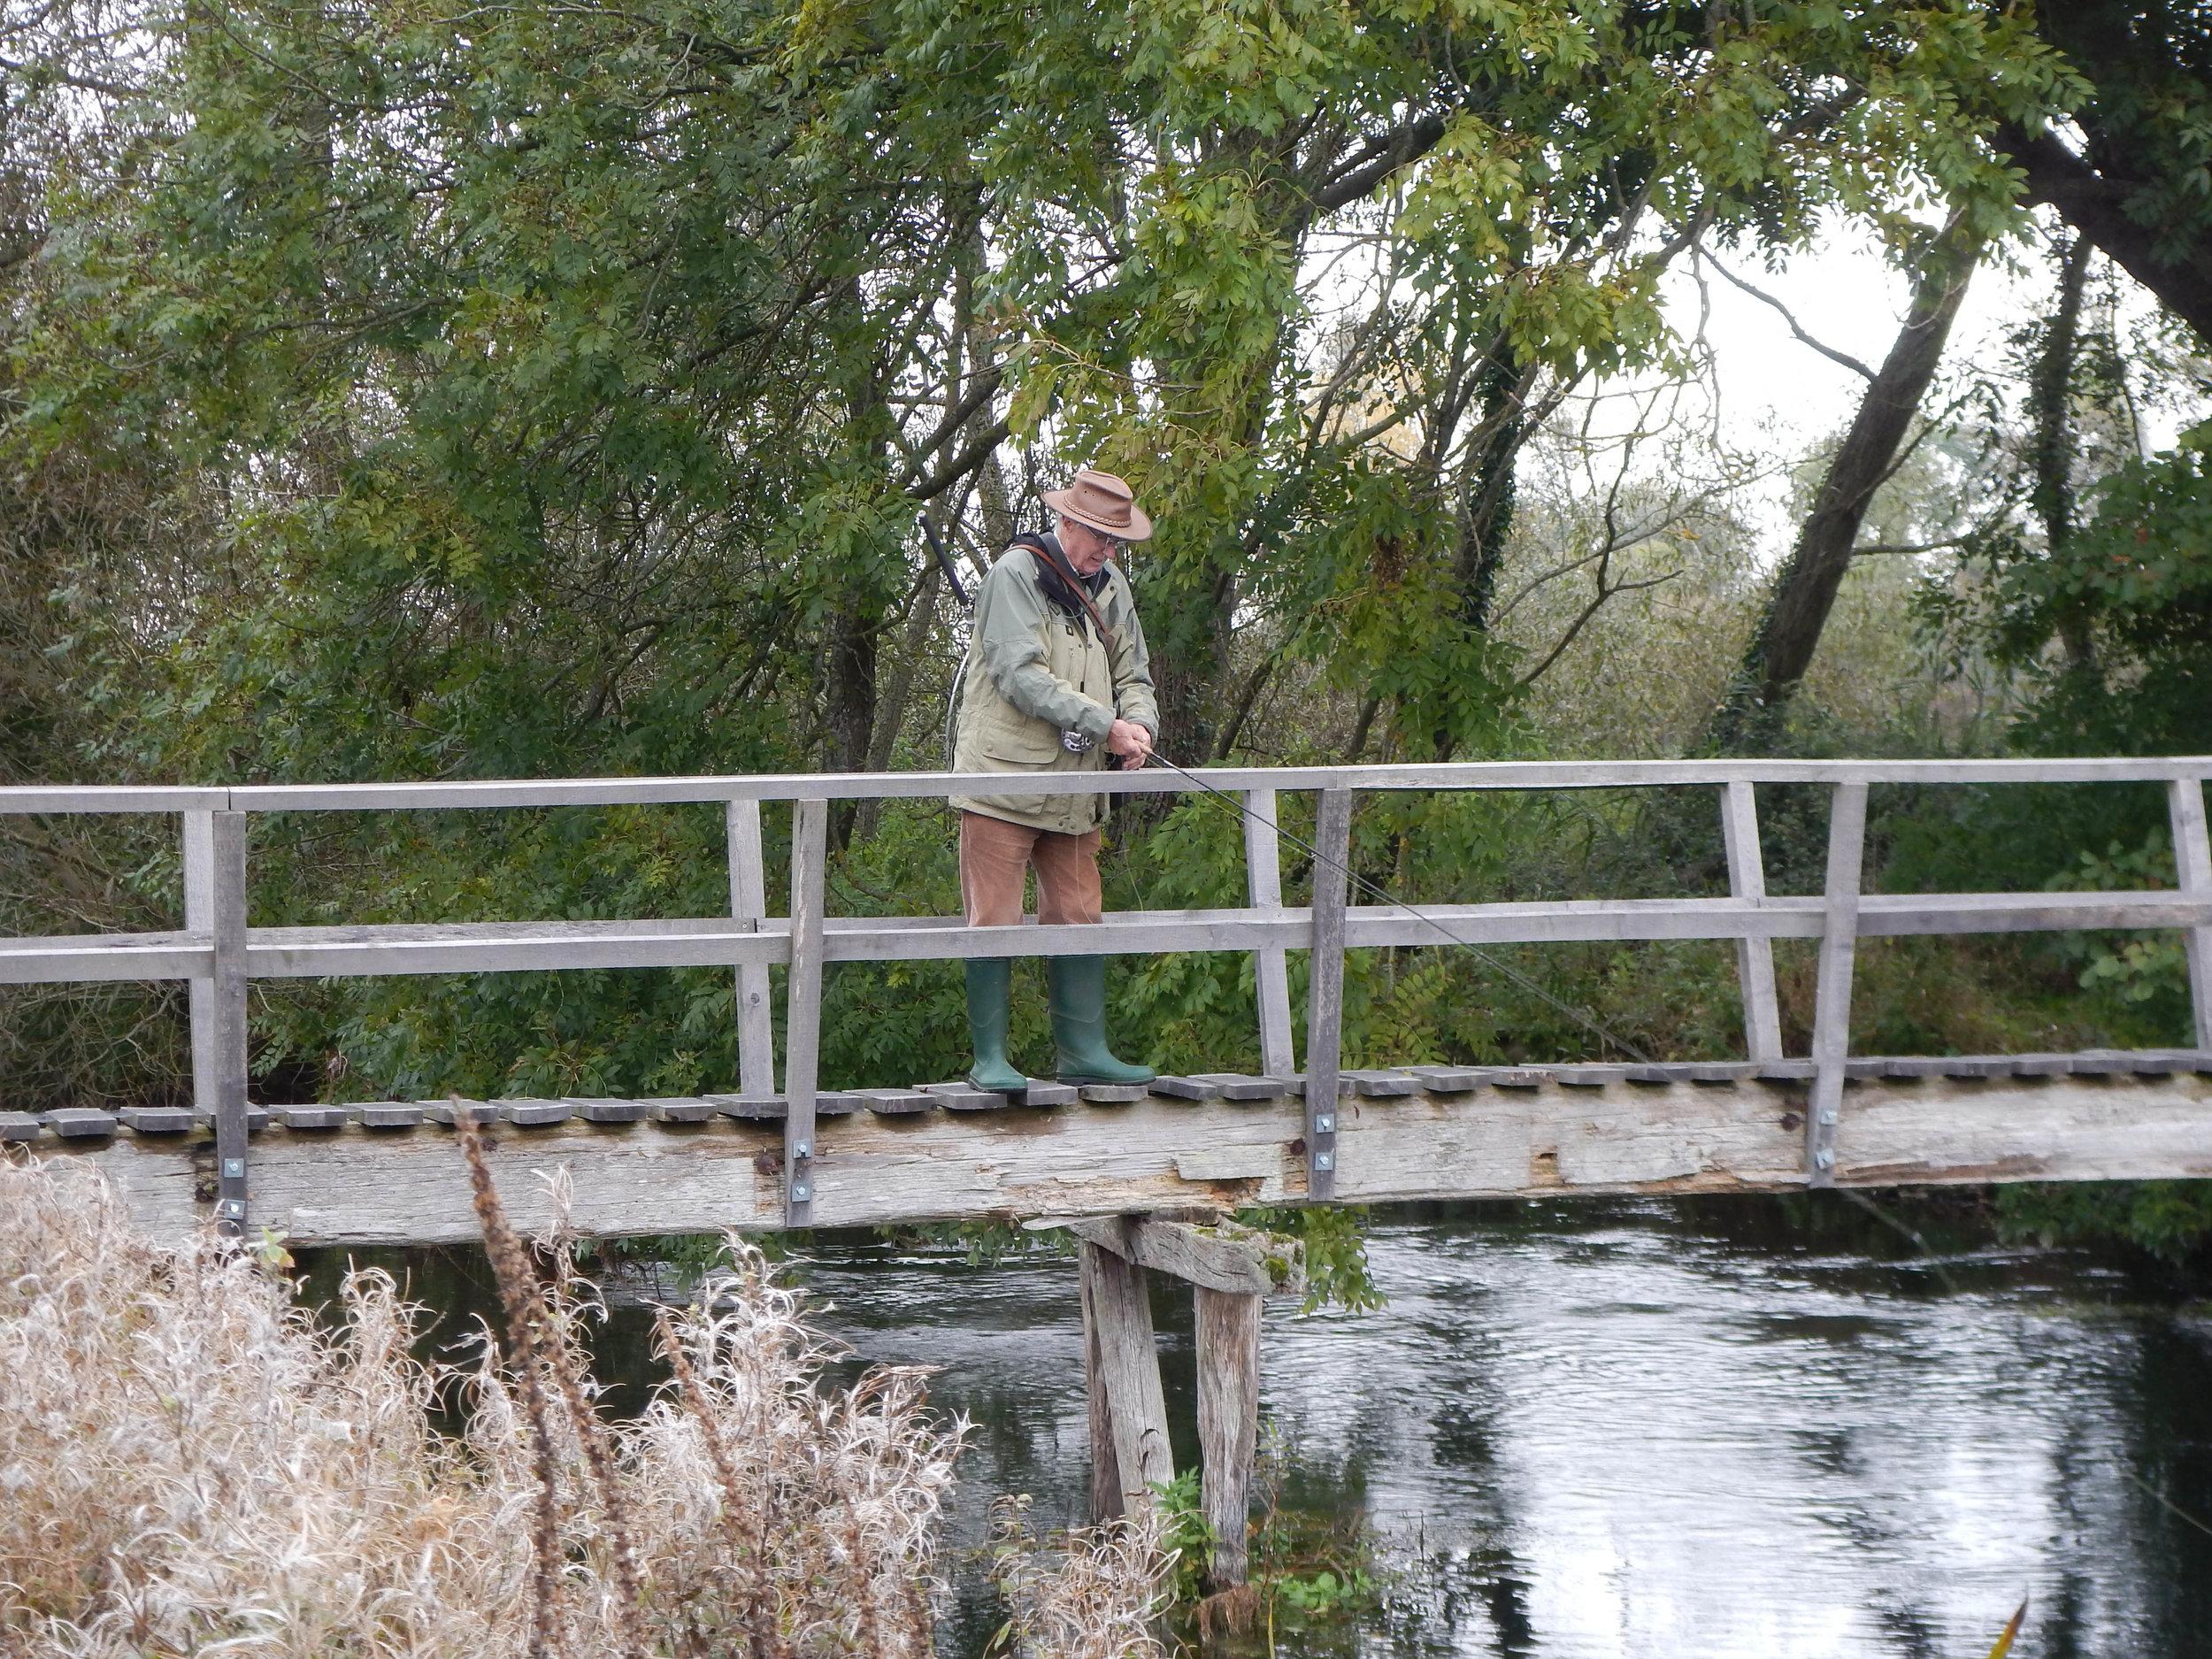 Where's that Salmon - David Gould